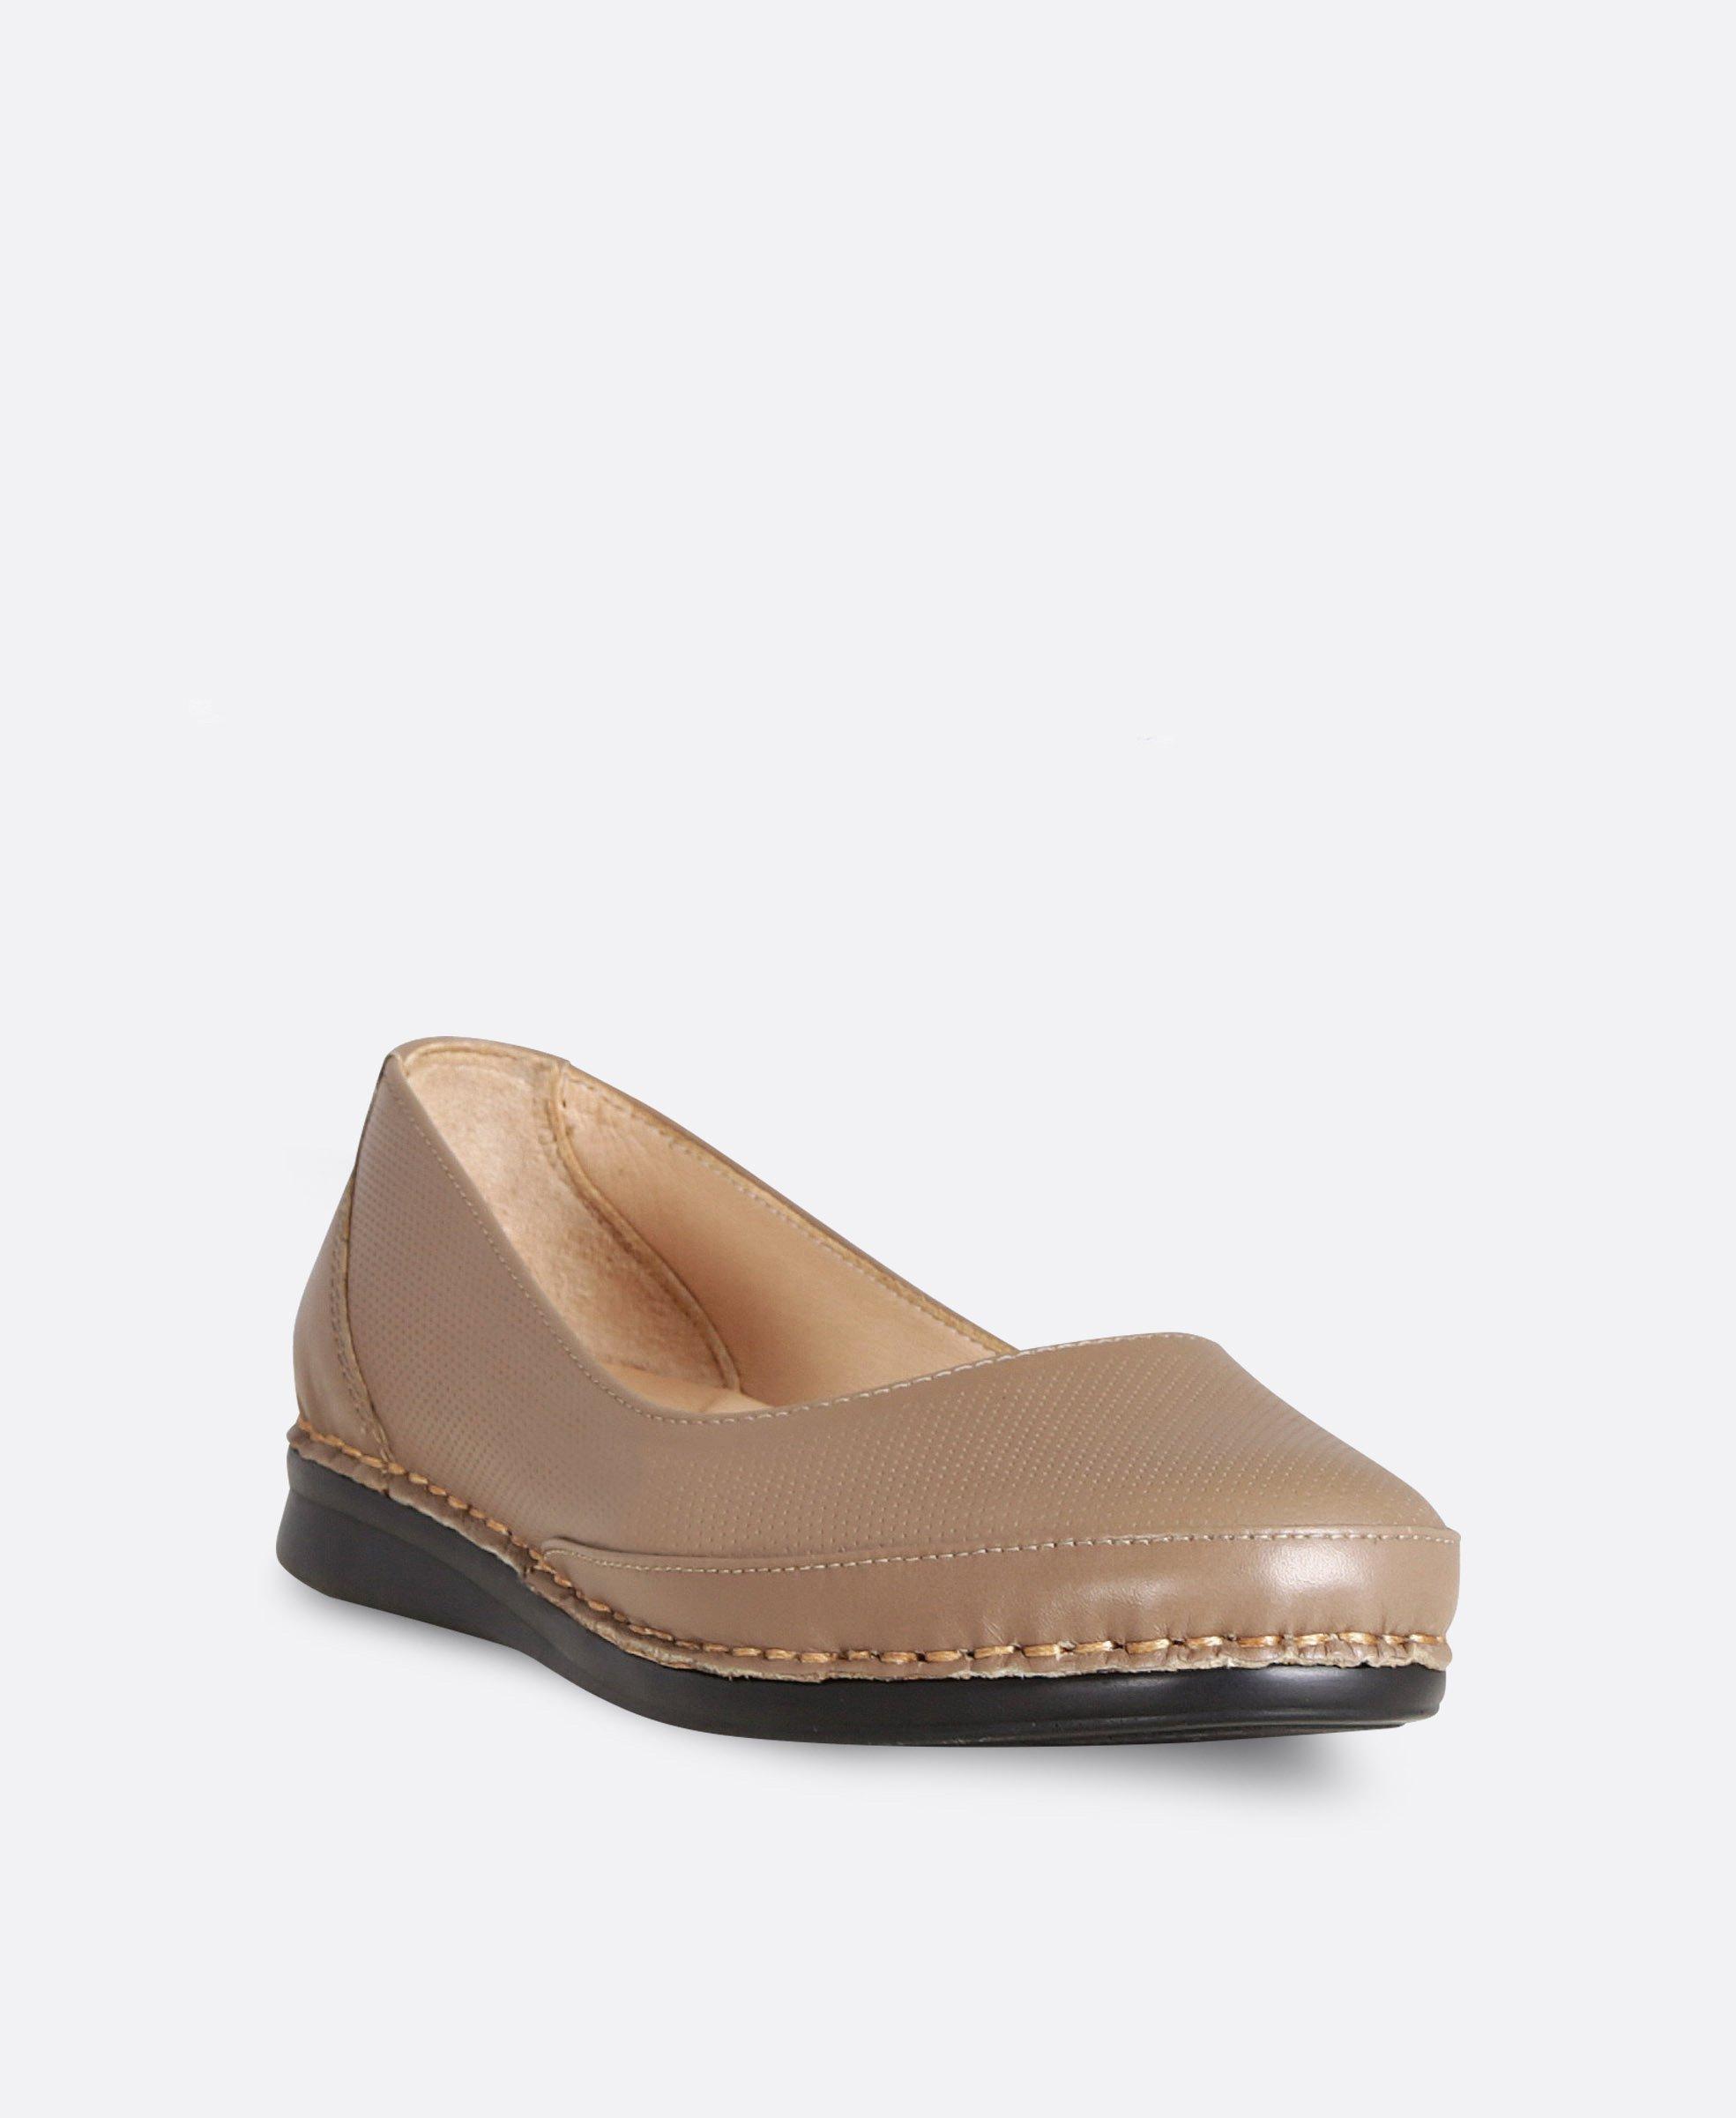 کفش زنانه چرم 0388